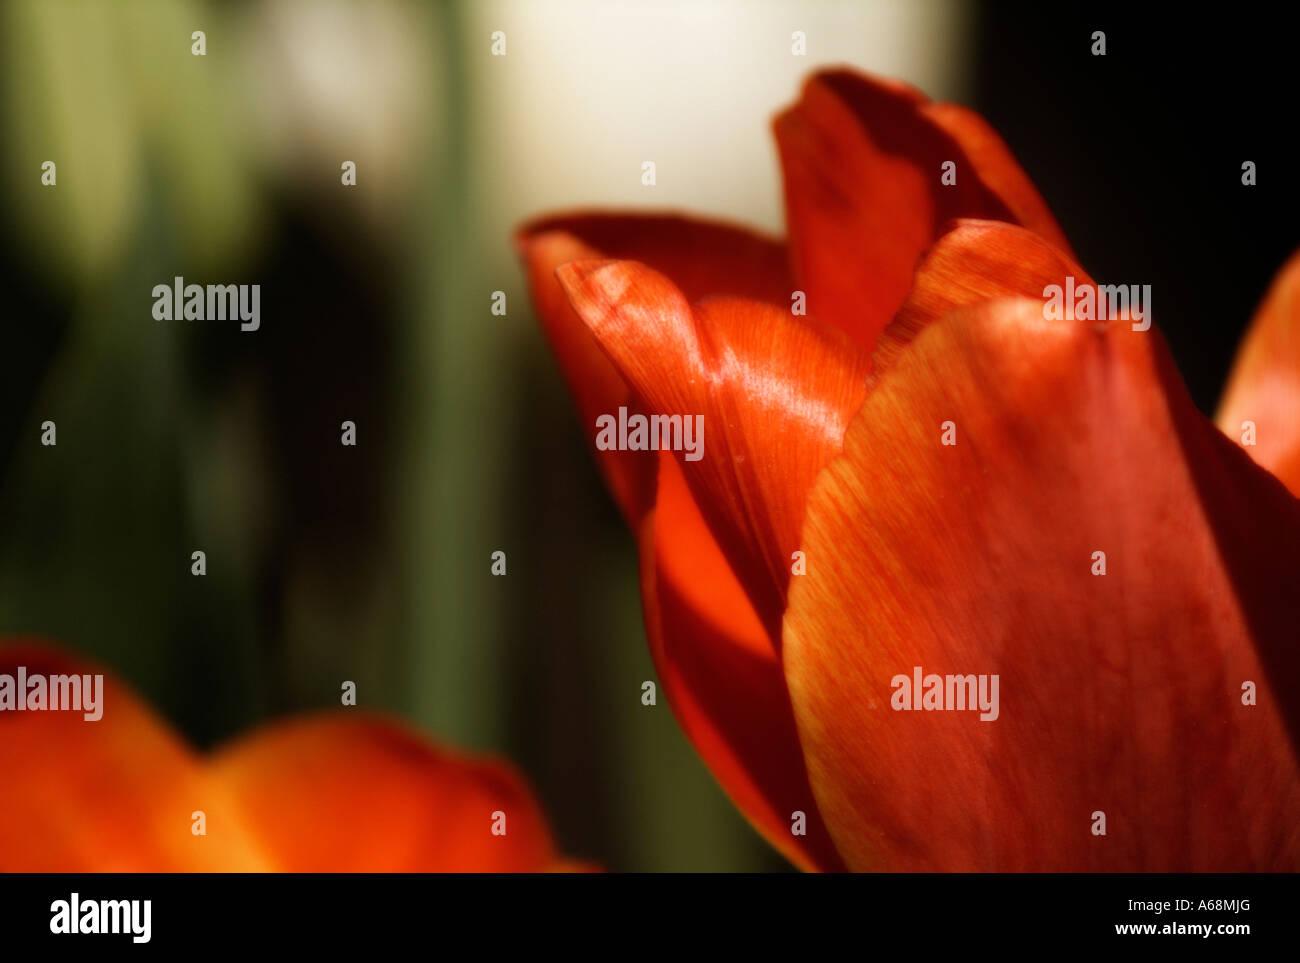 Close up of tulip (tulipa) flowers. Stock Photo